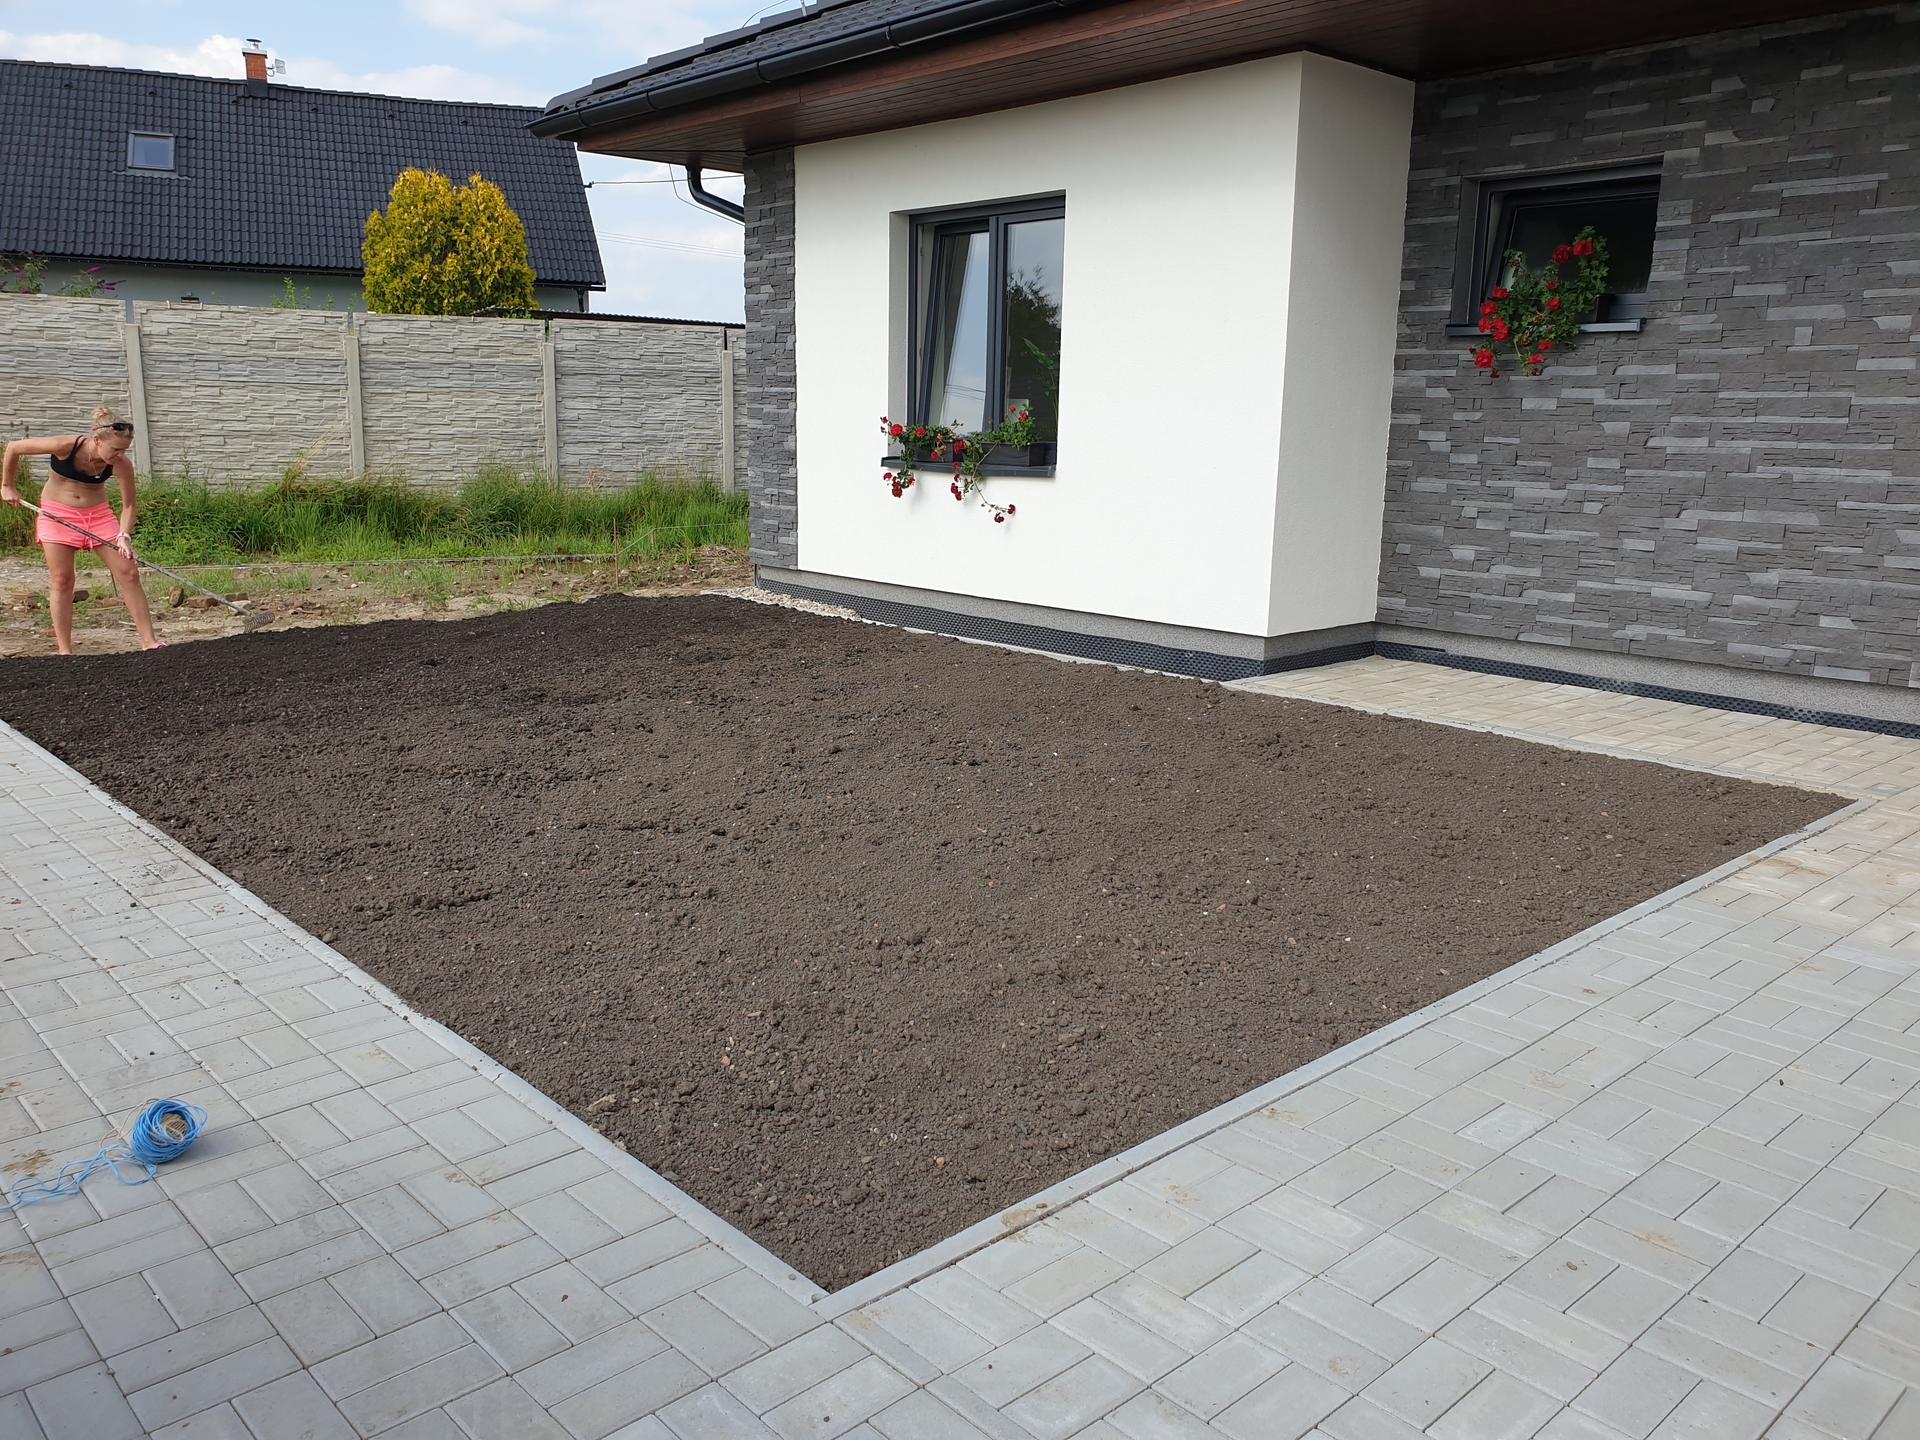 Zahrada a terasa - Obrázek č. 46